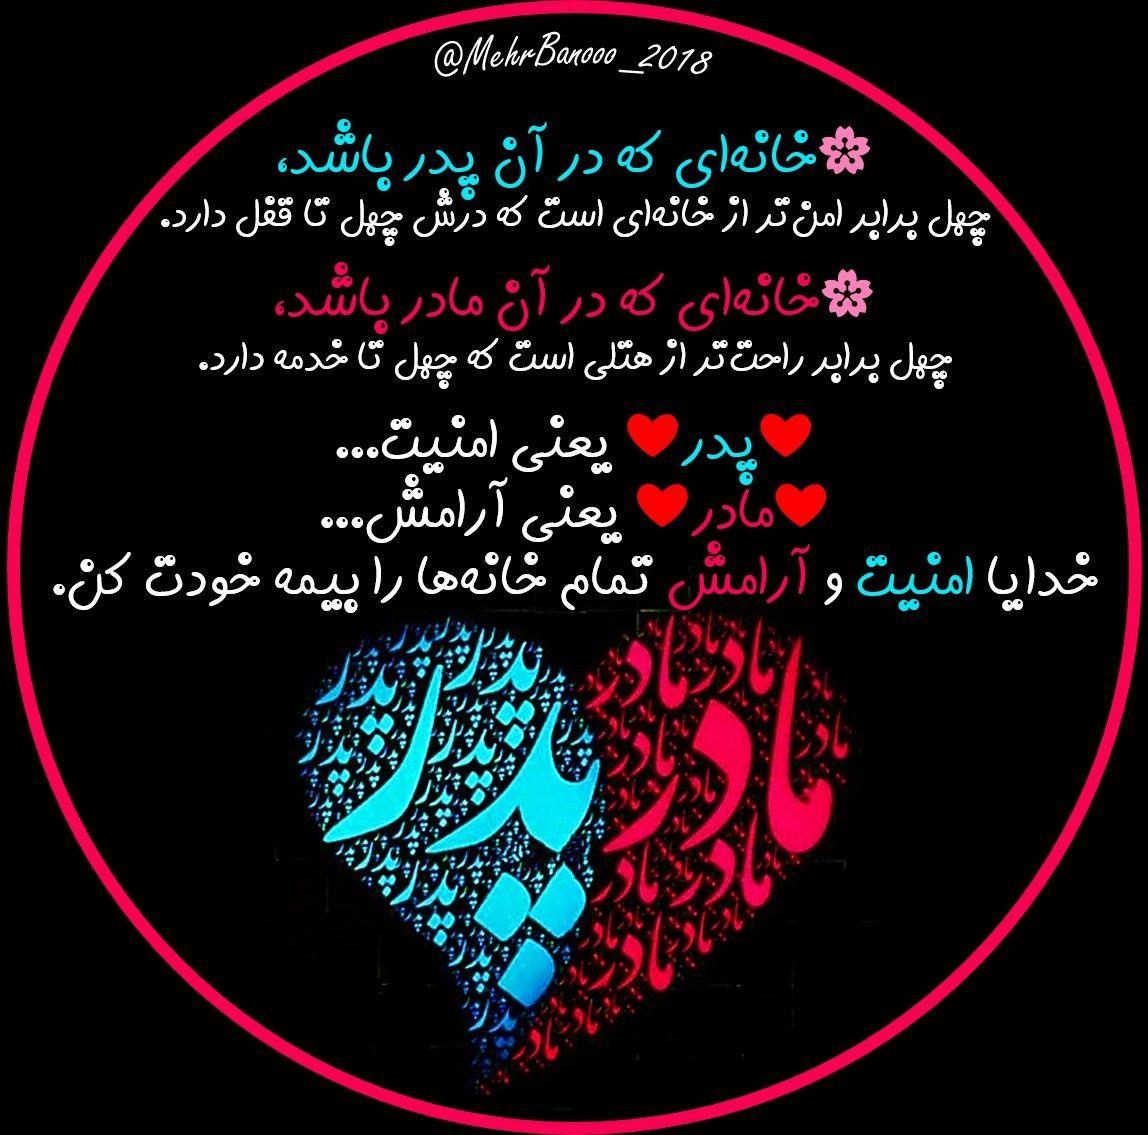 عکس نوشته عکس پروفایل کانال تلگرام مهر بانو ۲۰۱۸ Mehrbanooo 2018 In 2021 Islamic Republic Darth Vader Republic